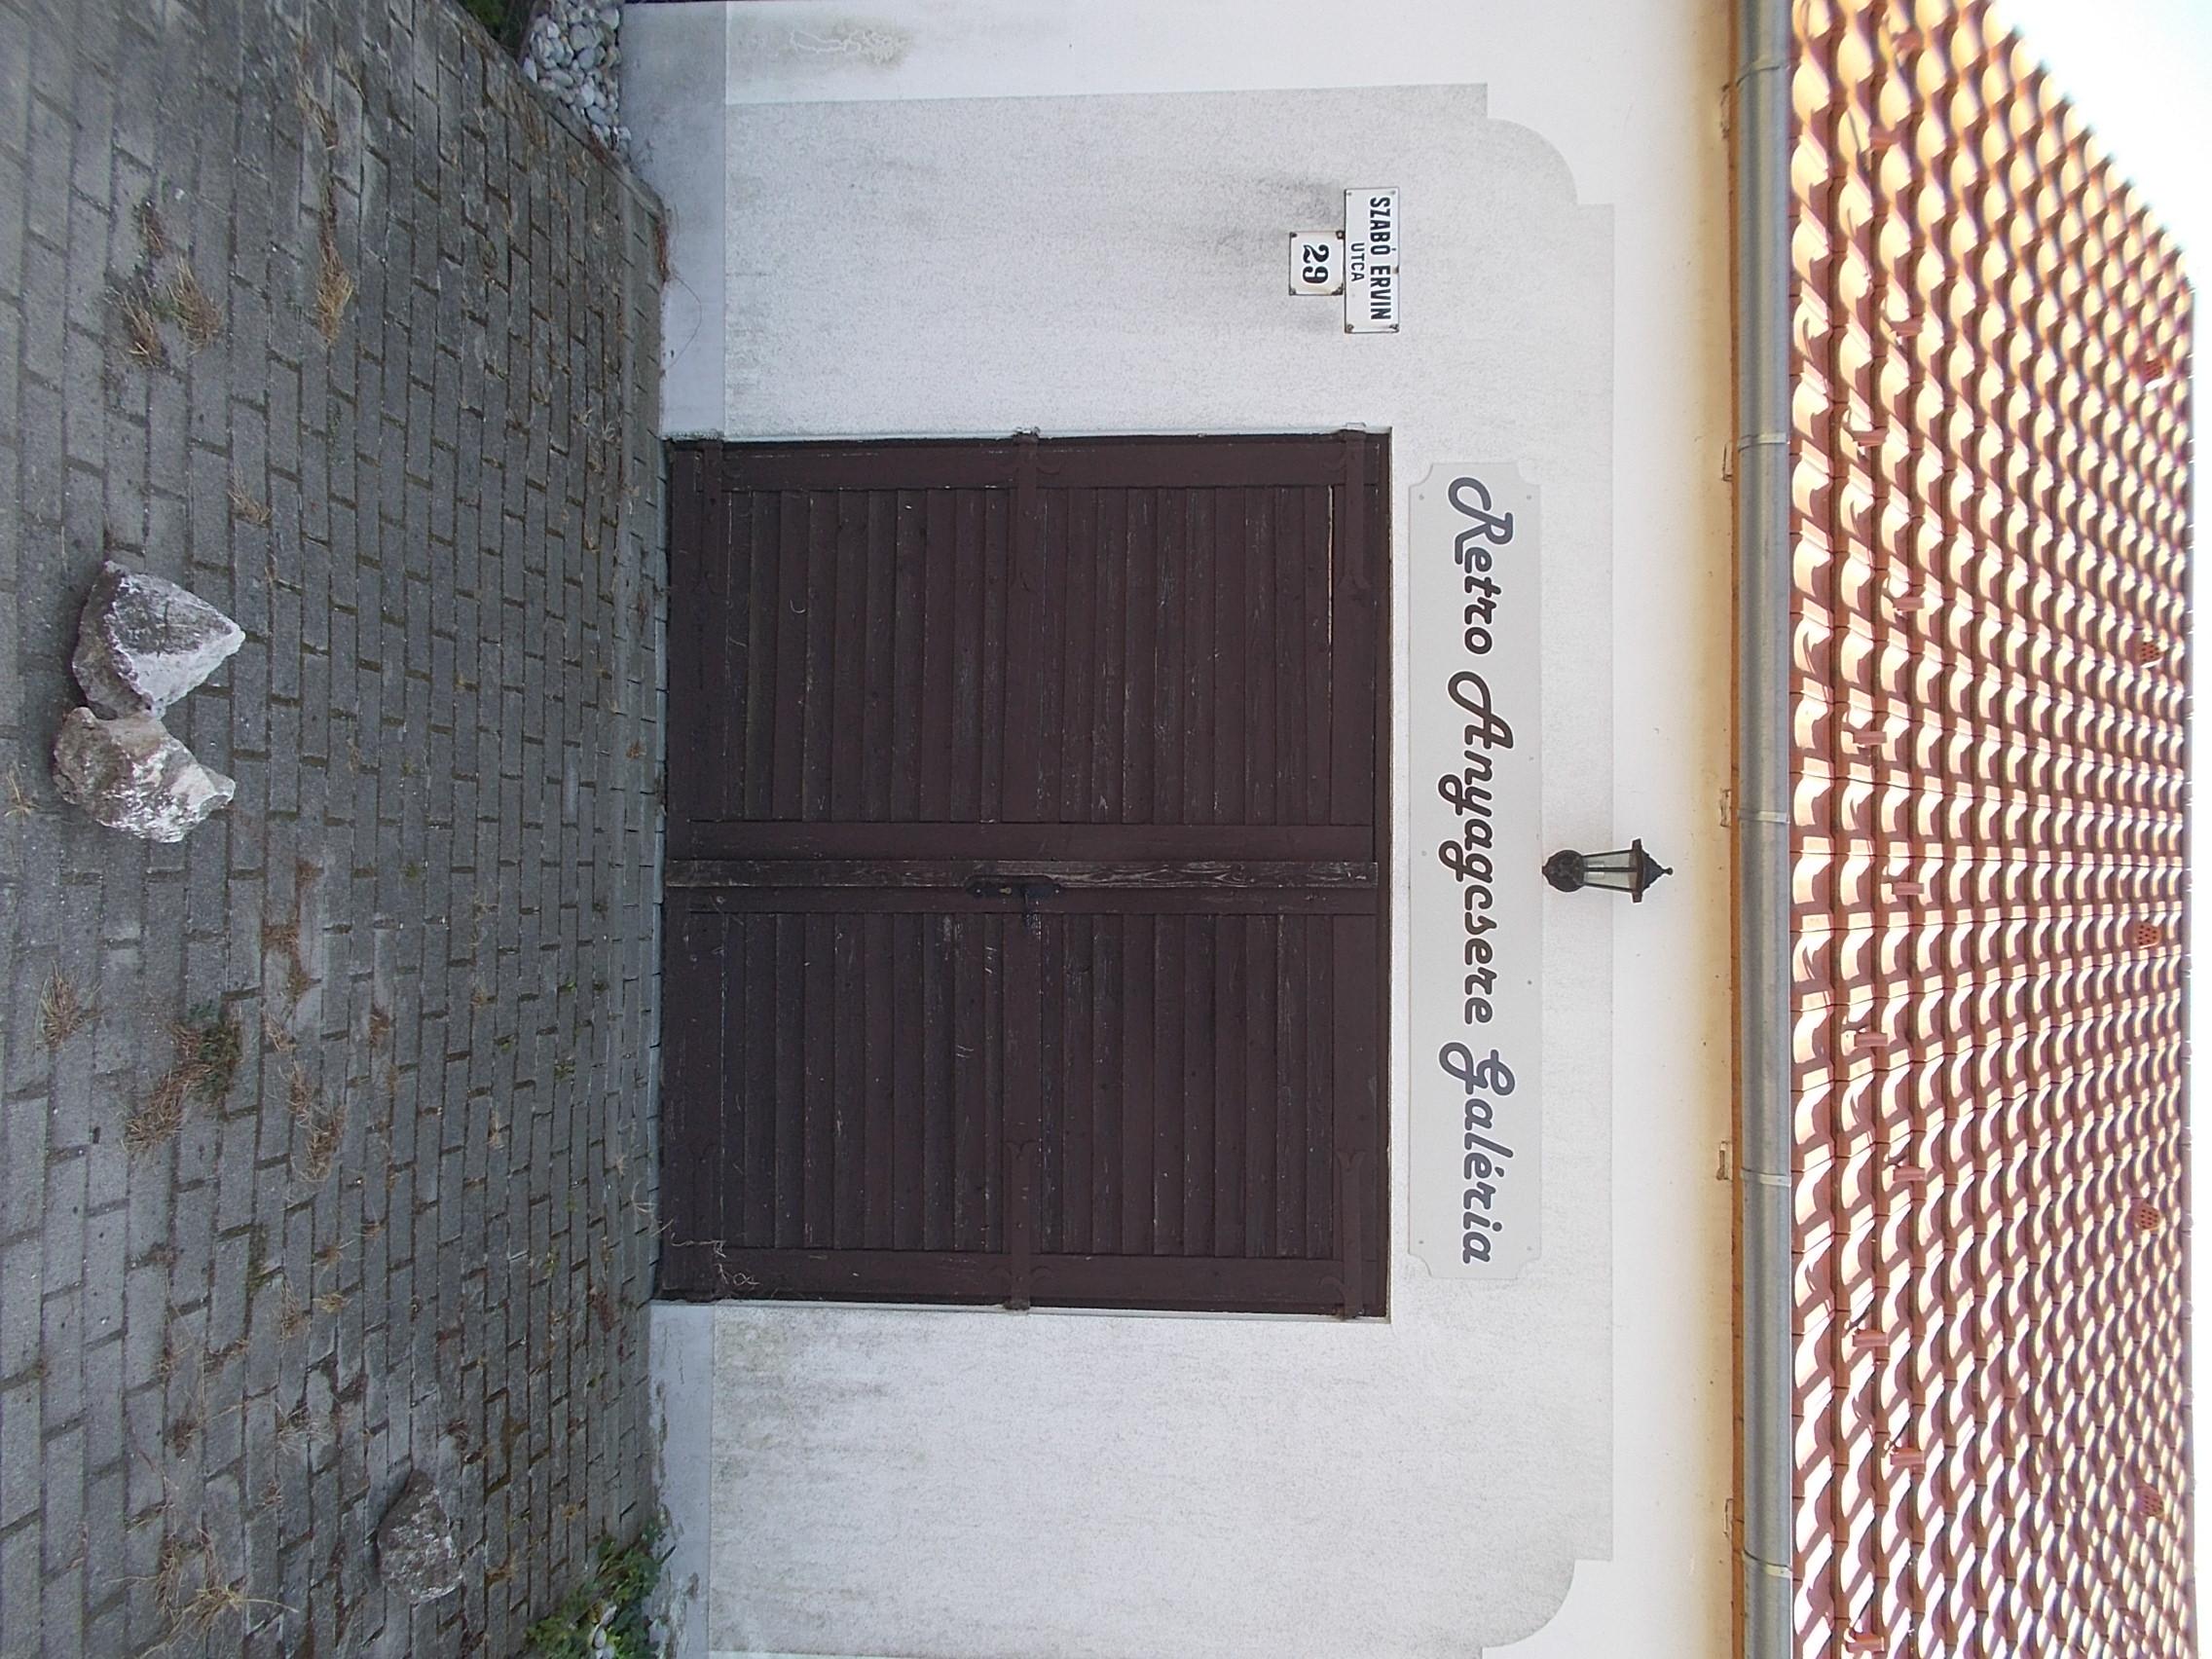 File:Retro Anyagcsere Galéria, 2019 Diszel.jpg - Wikimedia..